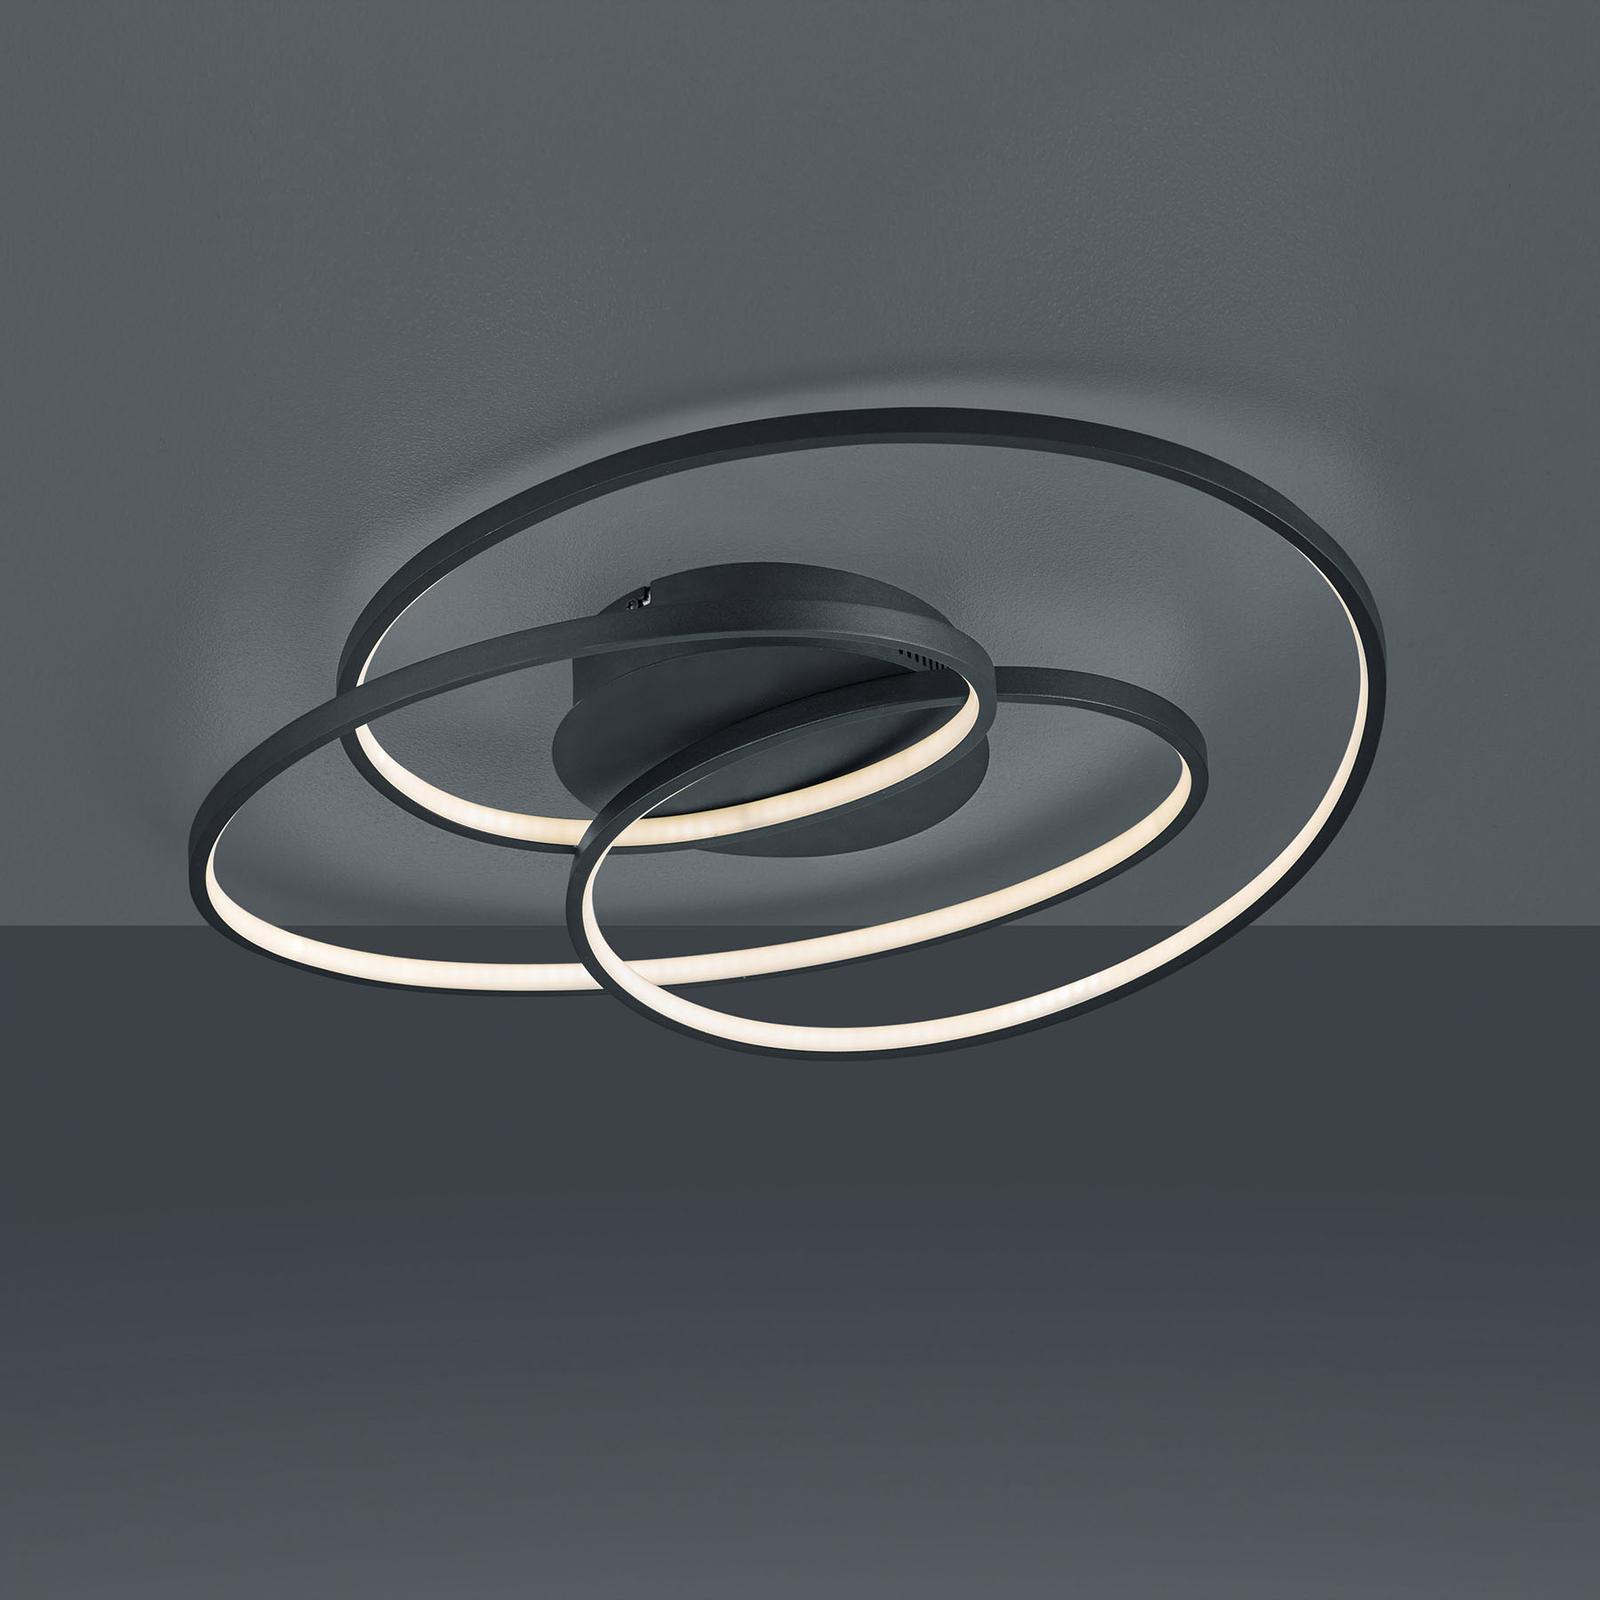 LED-kattovalaisin Gale, 60 cm, matta musta